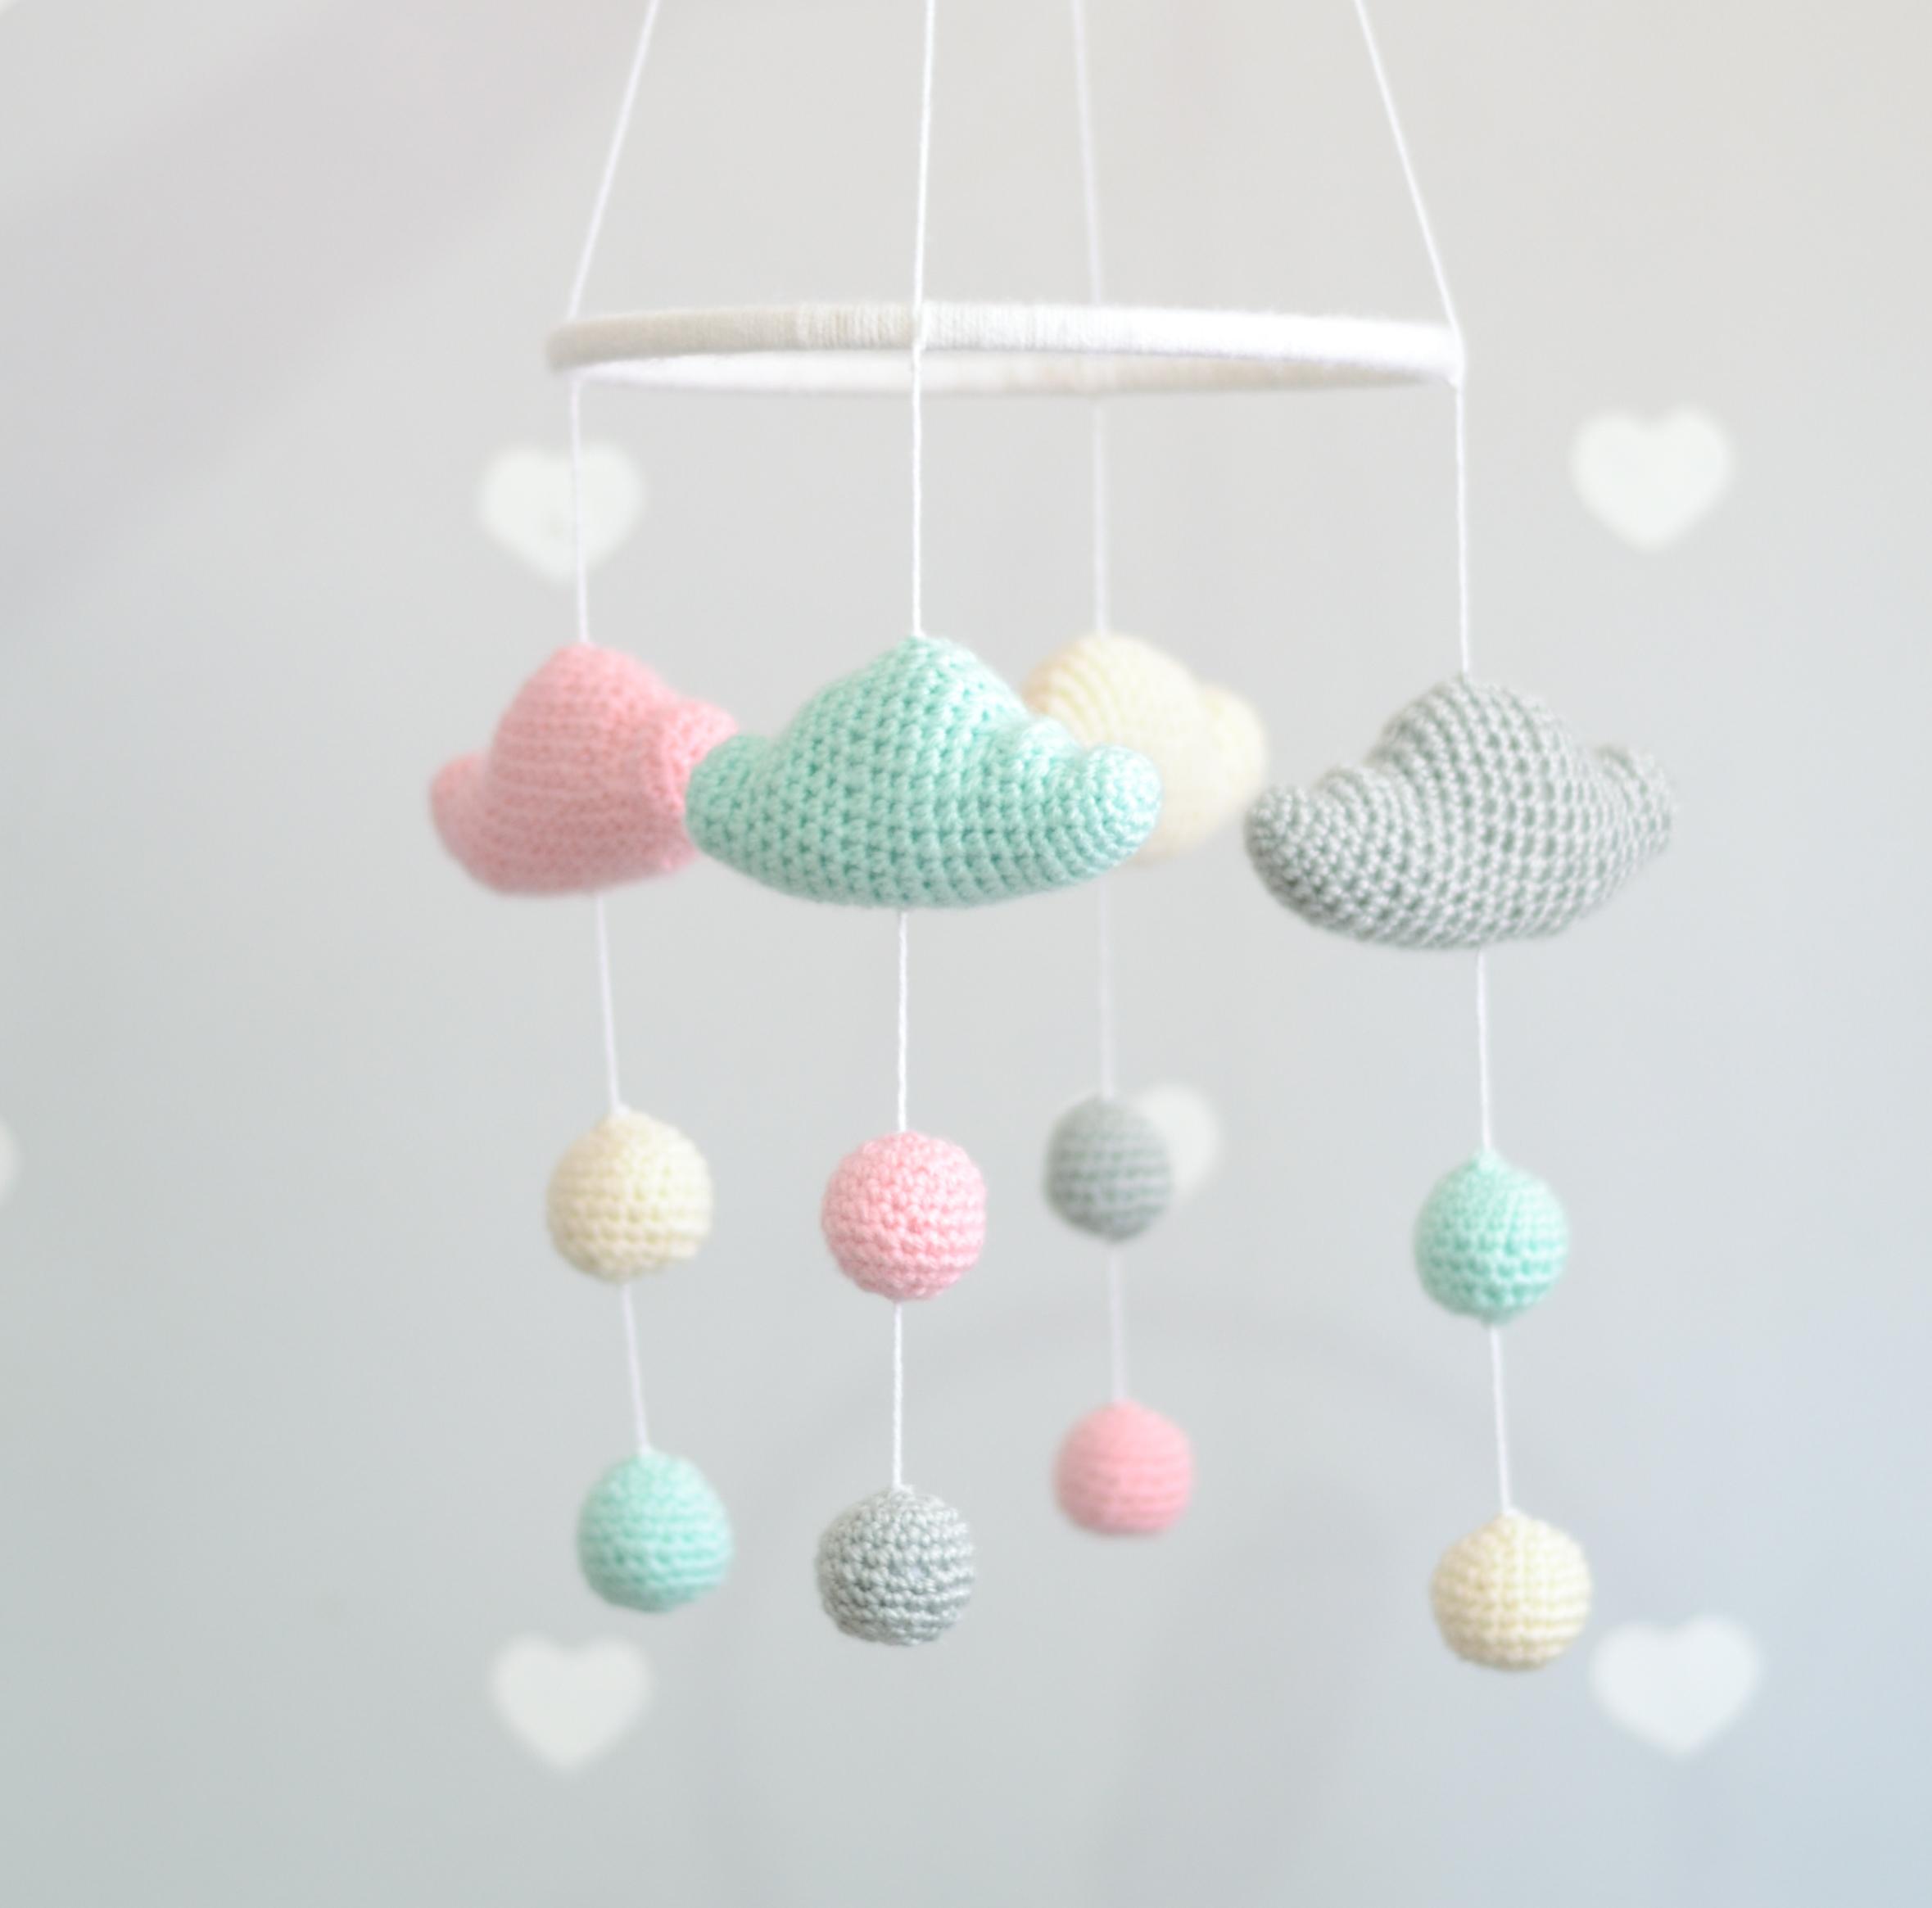 Receita de Amigurumi - almofada de nuvem de crochê fofinha ... | 2330x2359